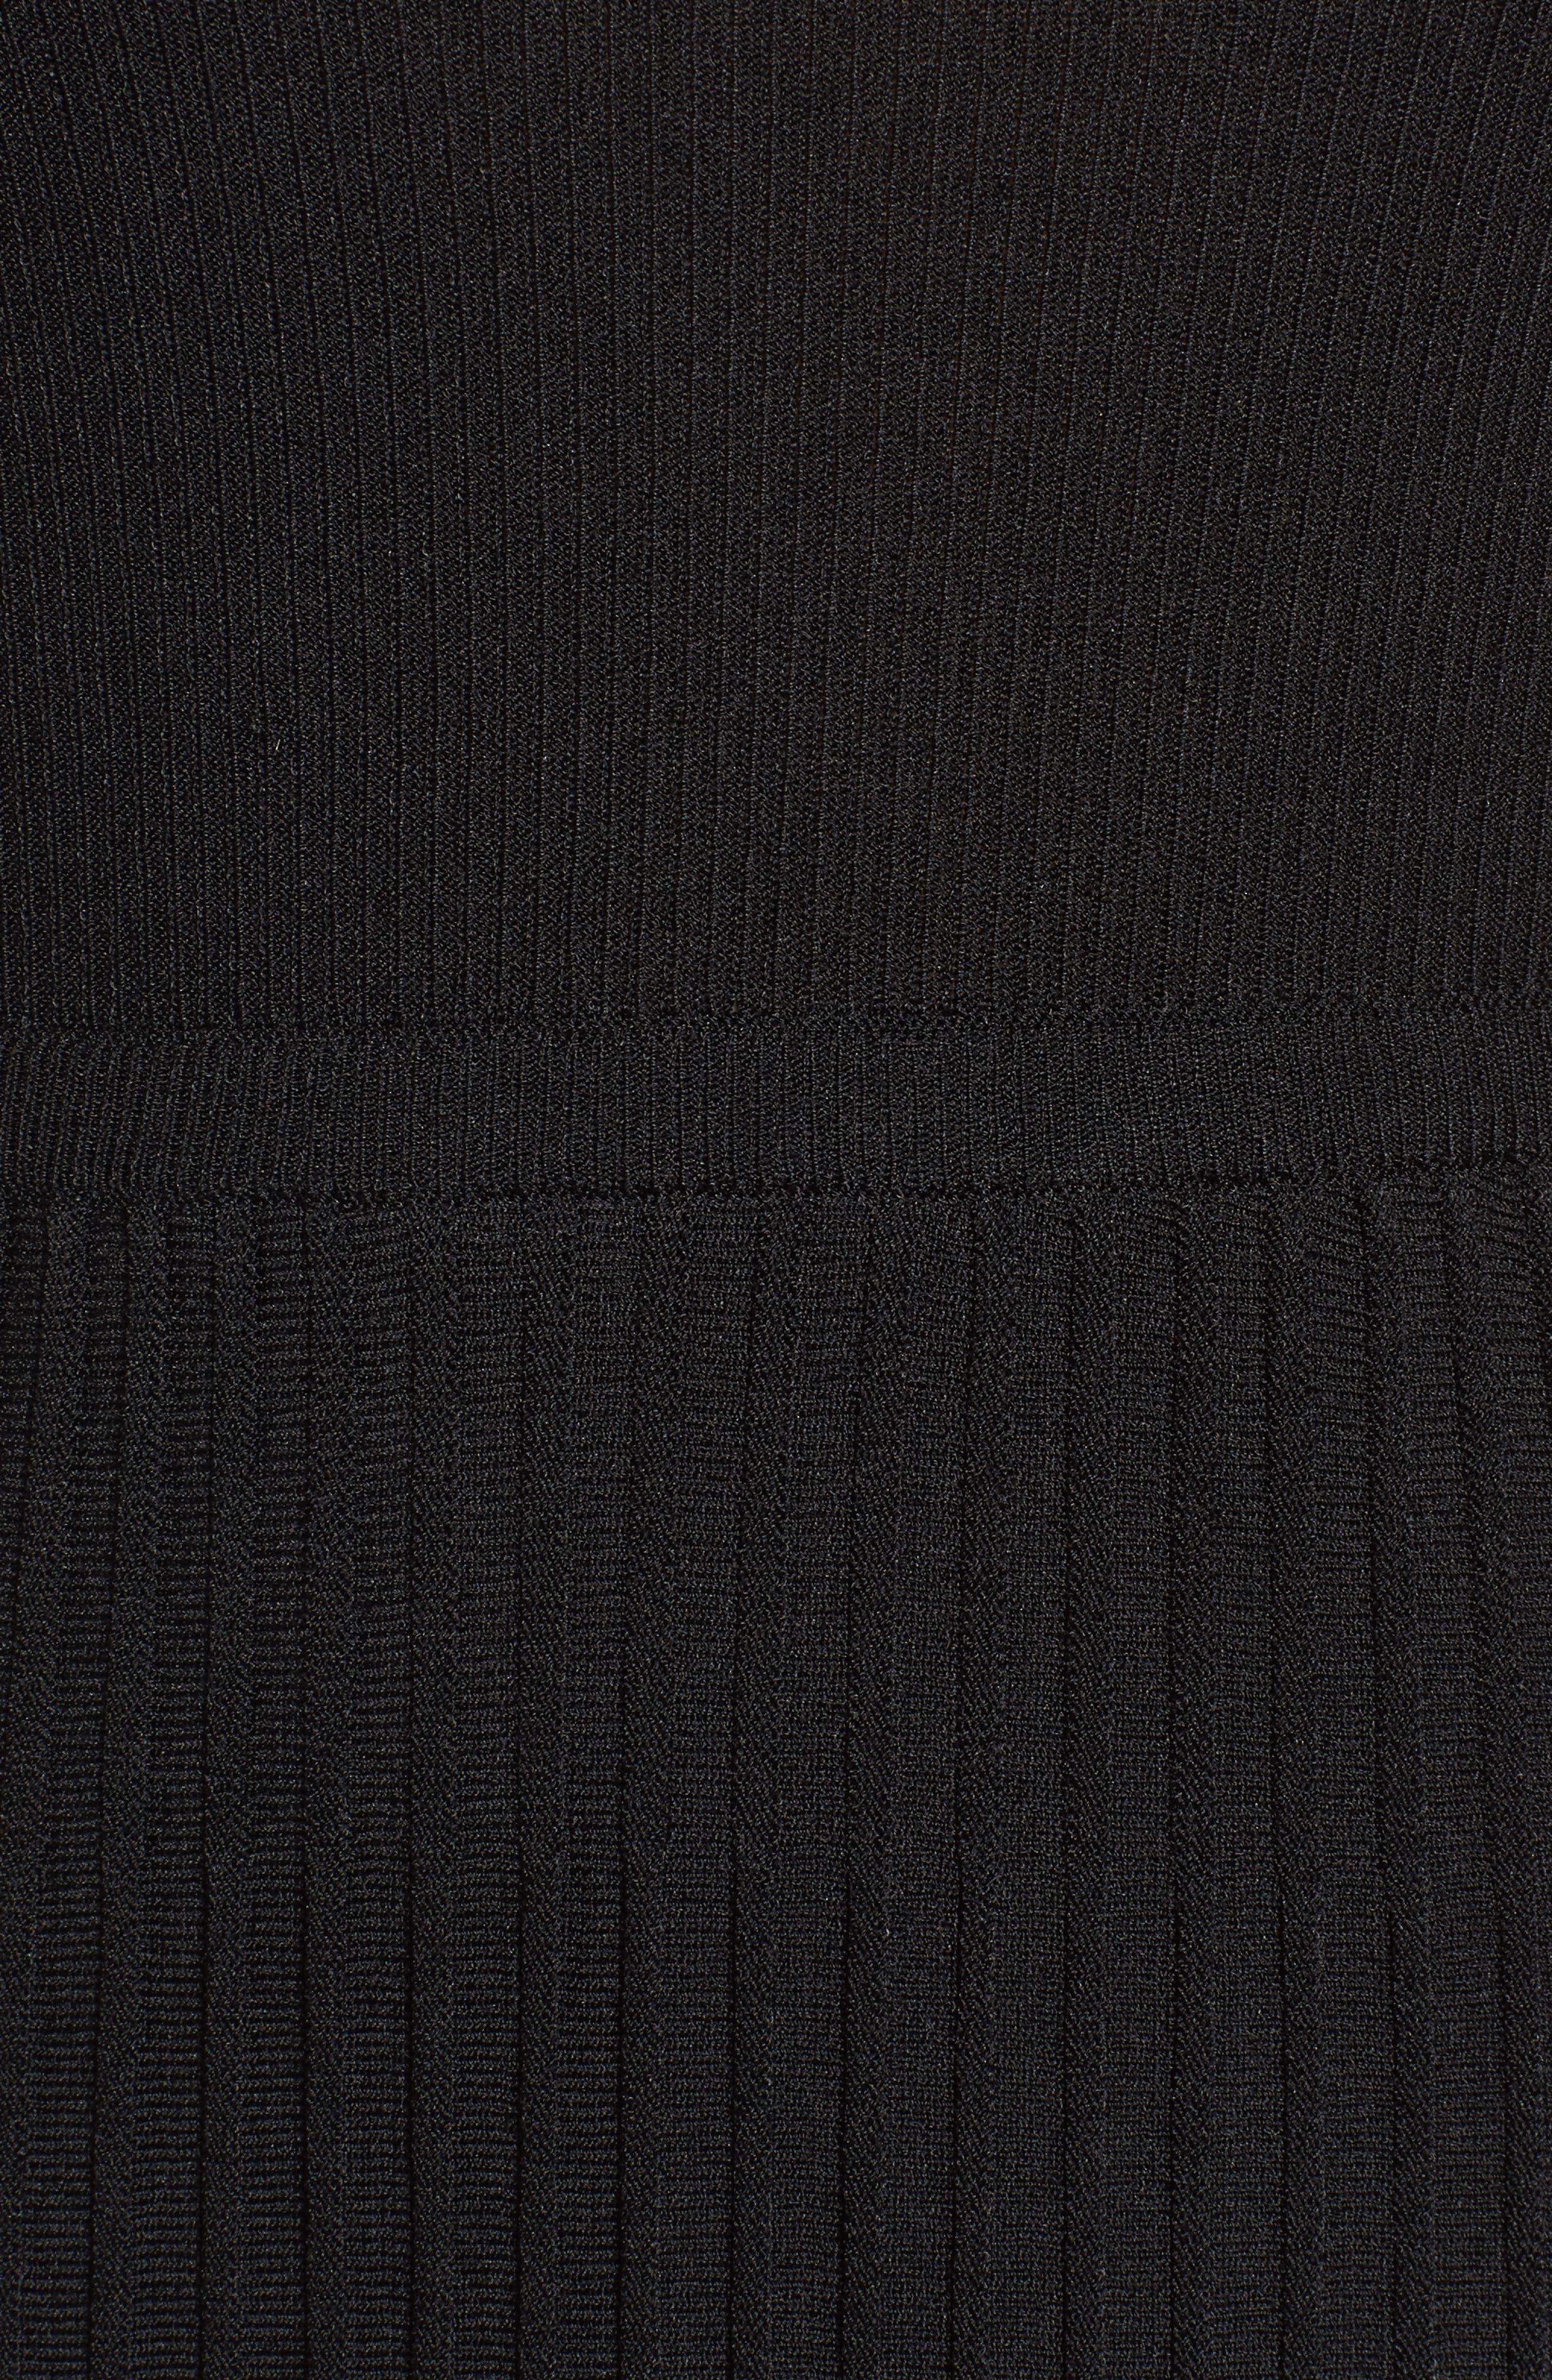 New York Pleated Sweater Midi Dress,                             Alternate thumbnail 5, color,                             Black